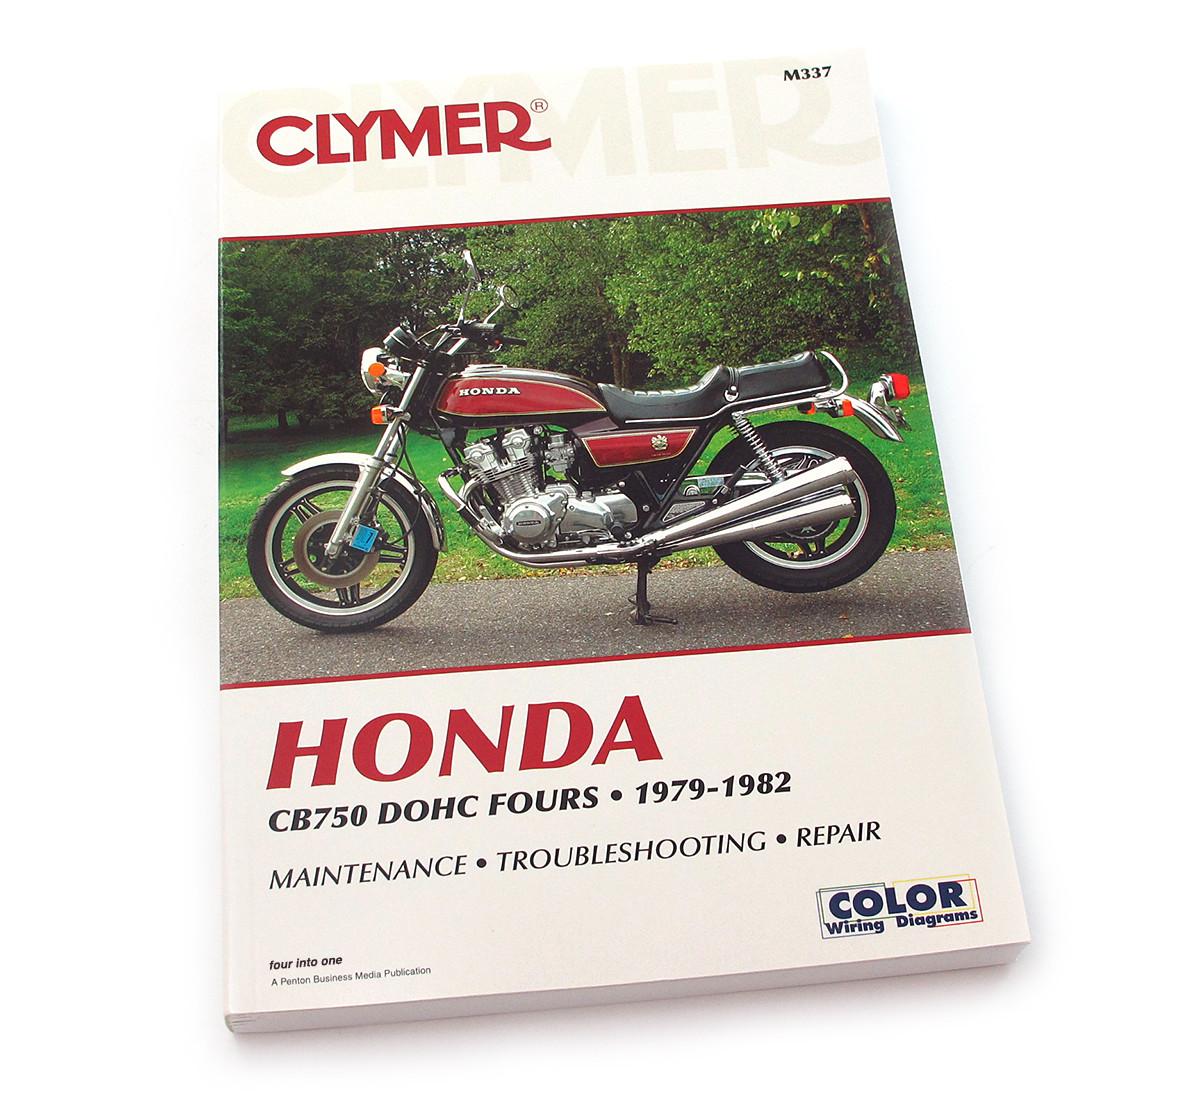 clymer manual honda cb750 dohc fours 1979 1982 [ 1200 x 1106 Pixel ]